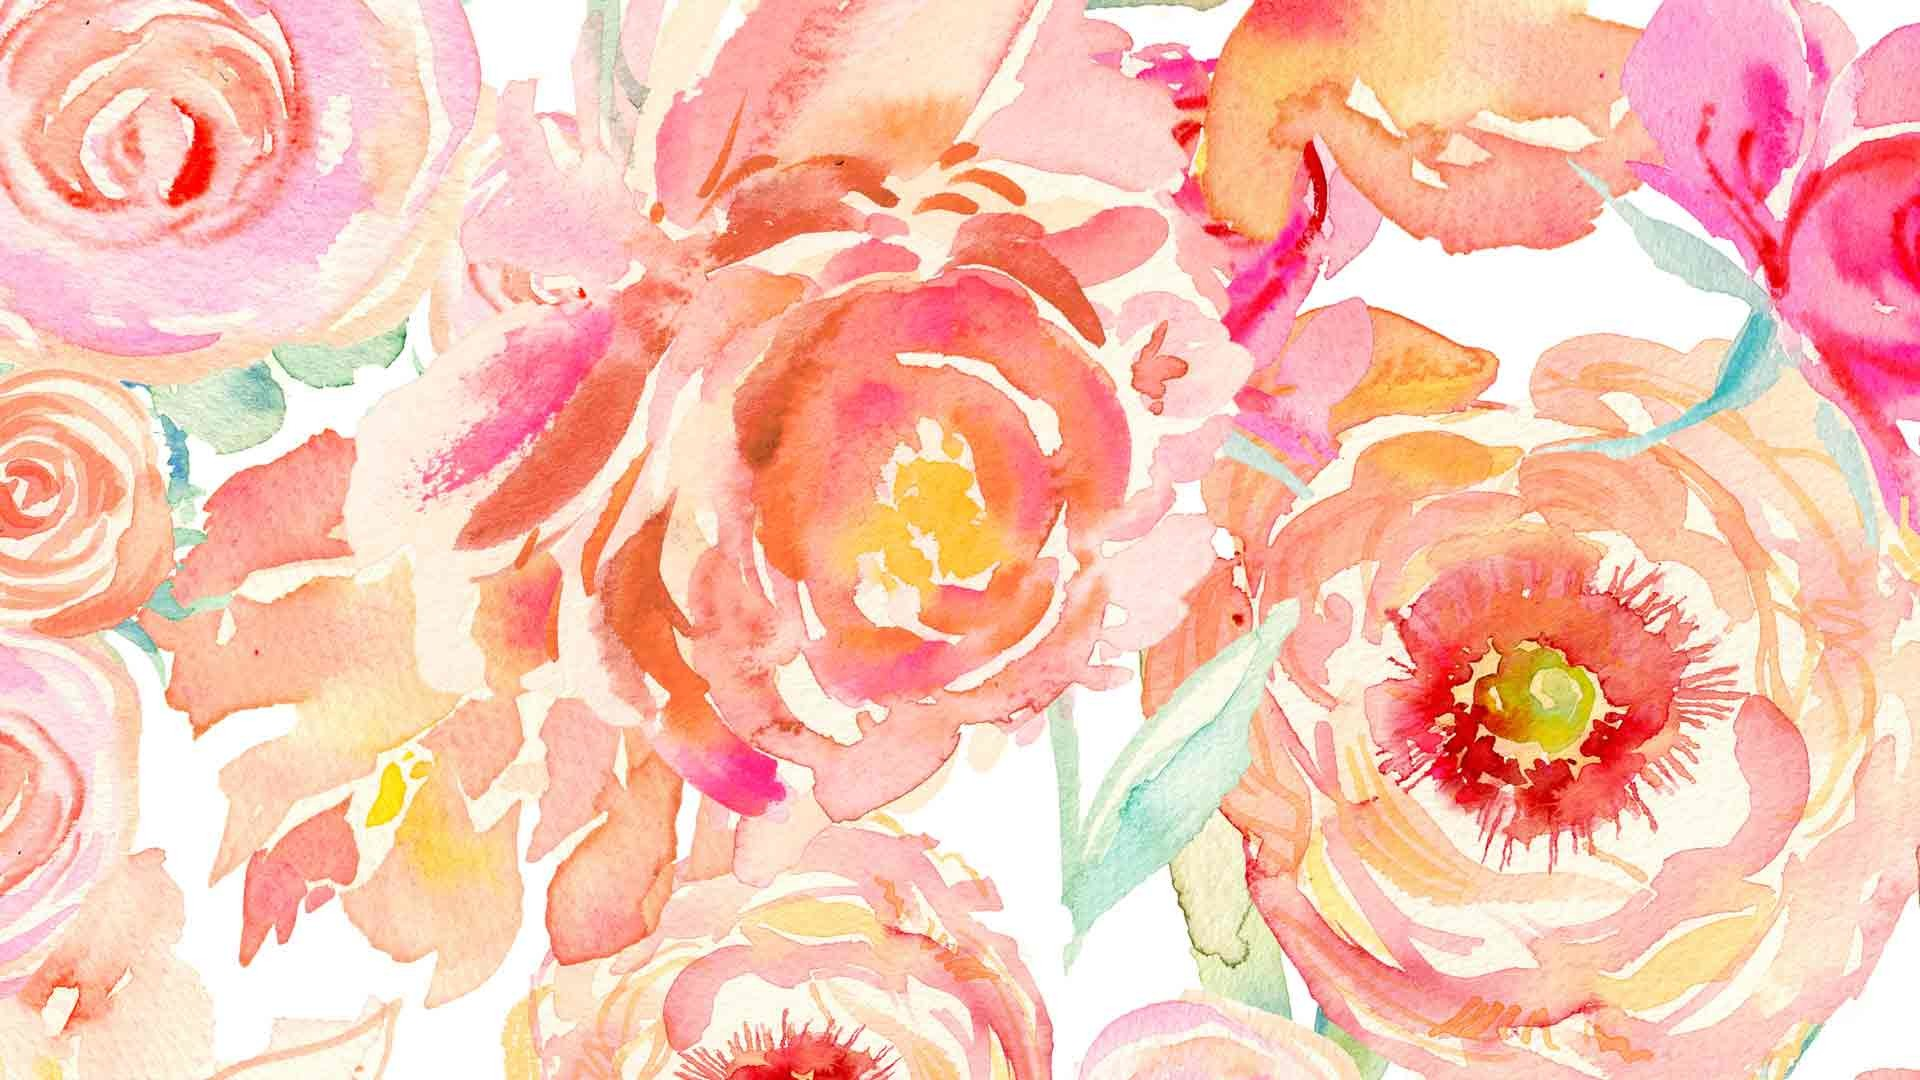 Watercolor Rose Wallpaper At Getdrawings Com Free For Personal Use